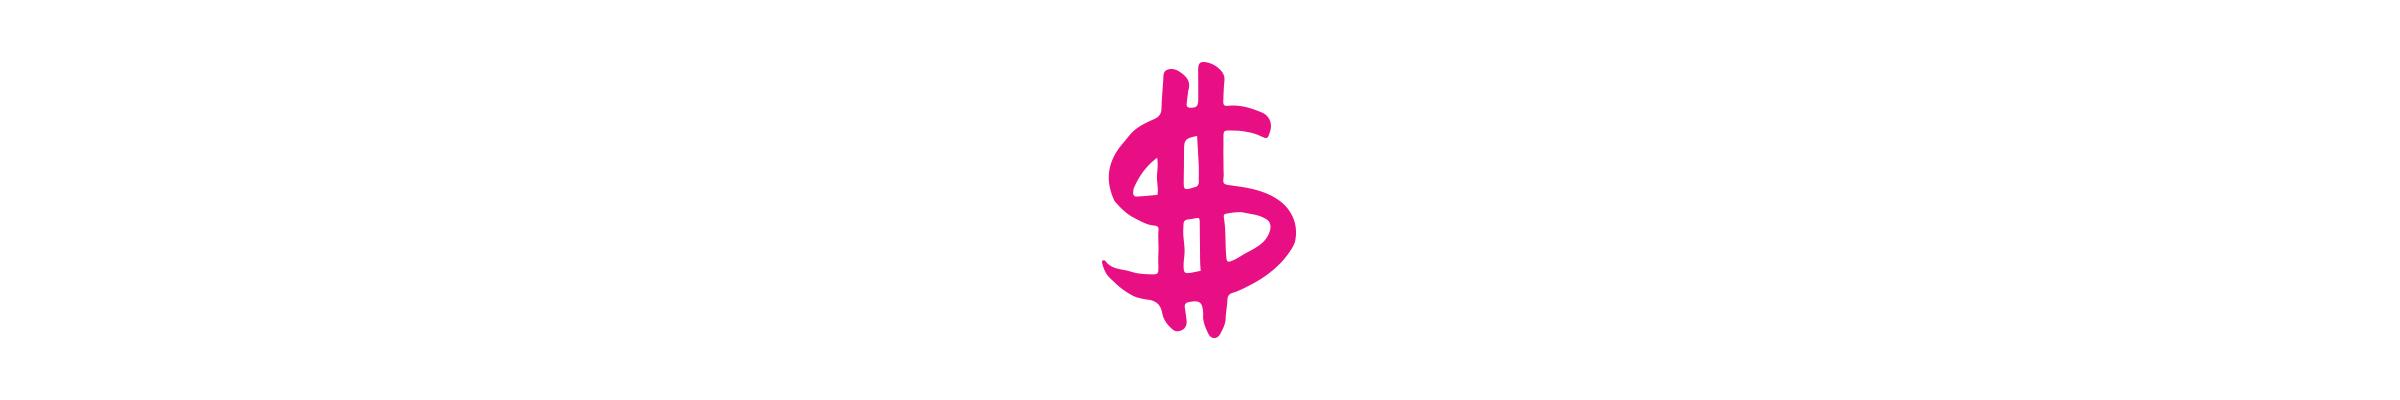 miki-icon-money-v2.png